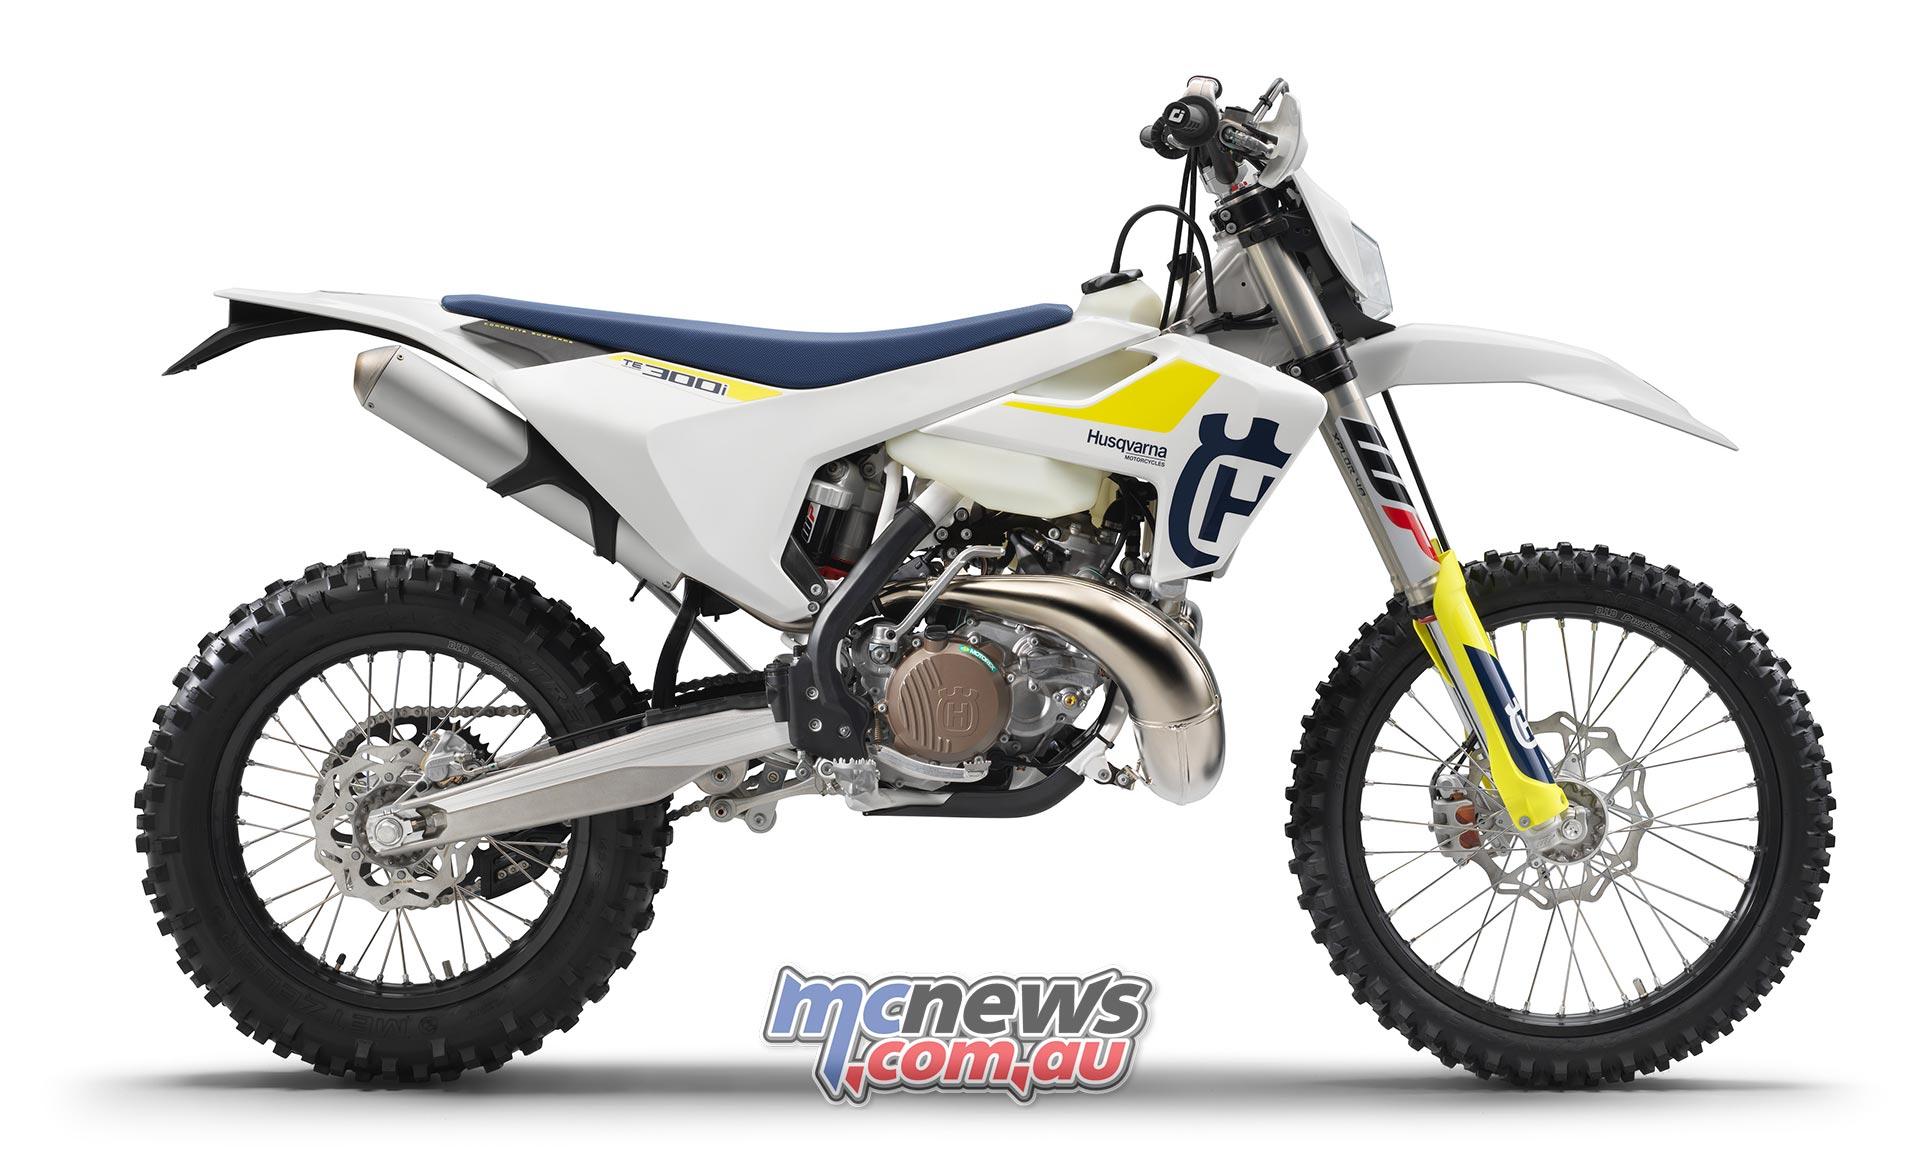 Husqvarna two-stroke enduro bikes EFI only from 2019